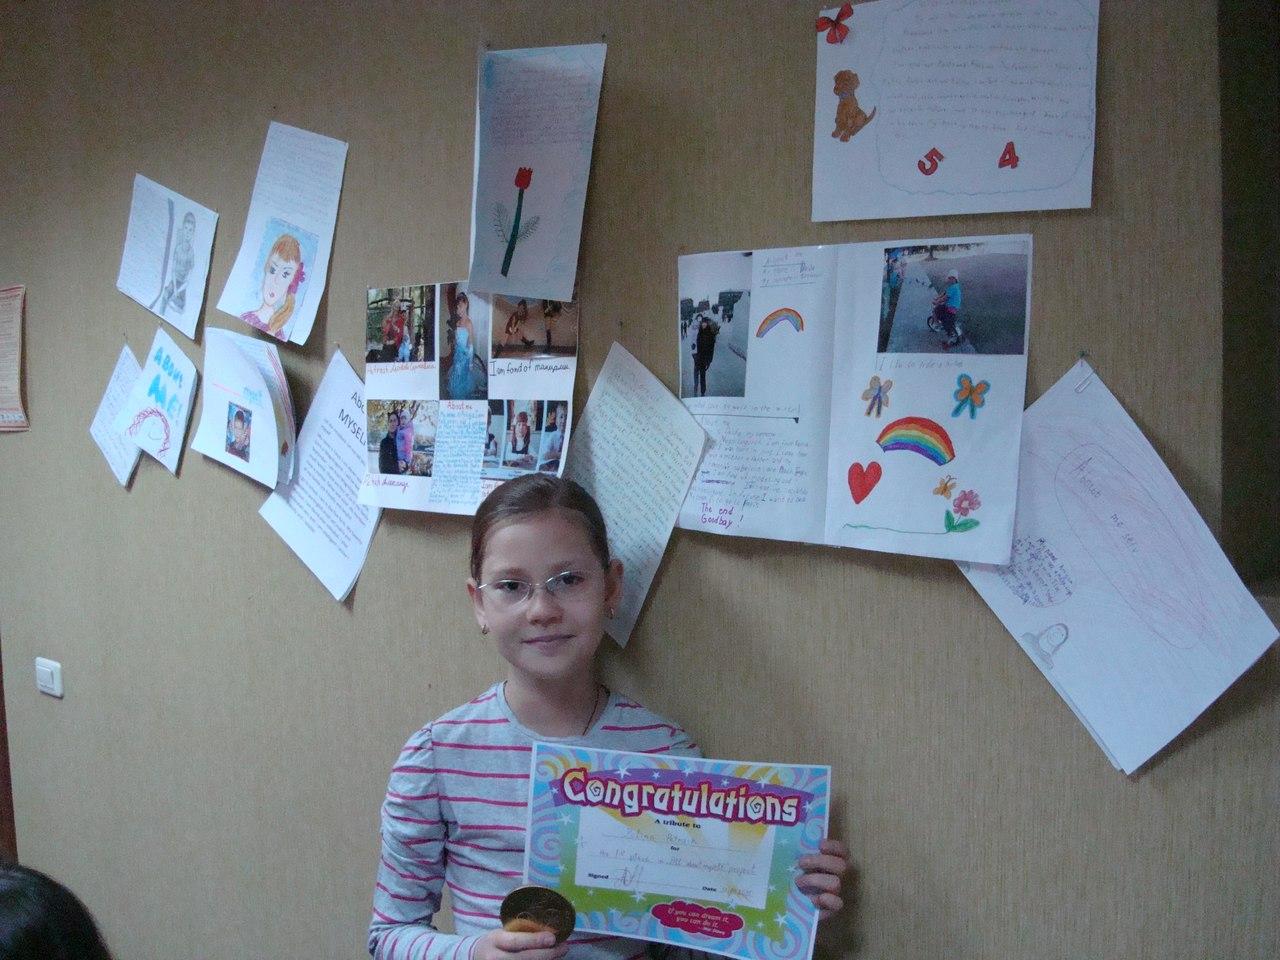 Polina Petrash